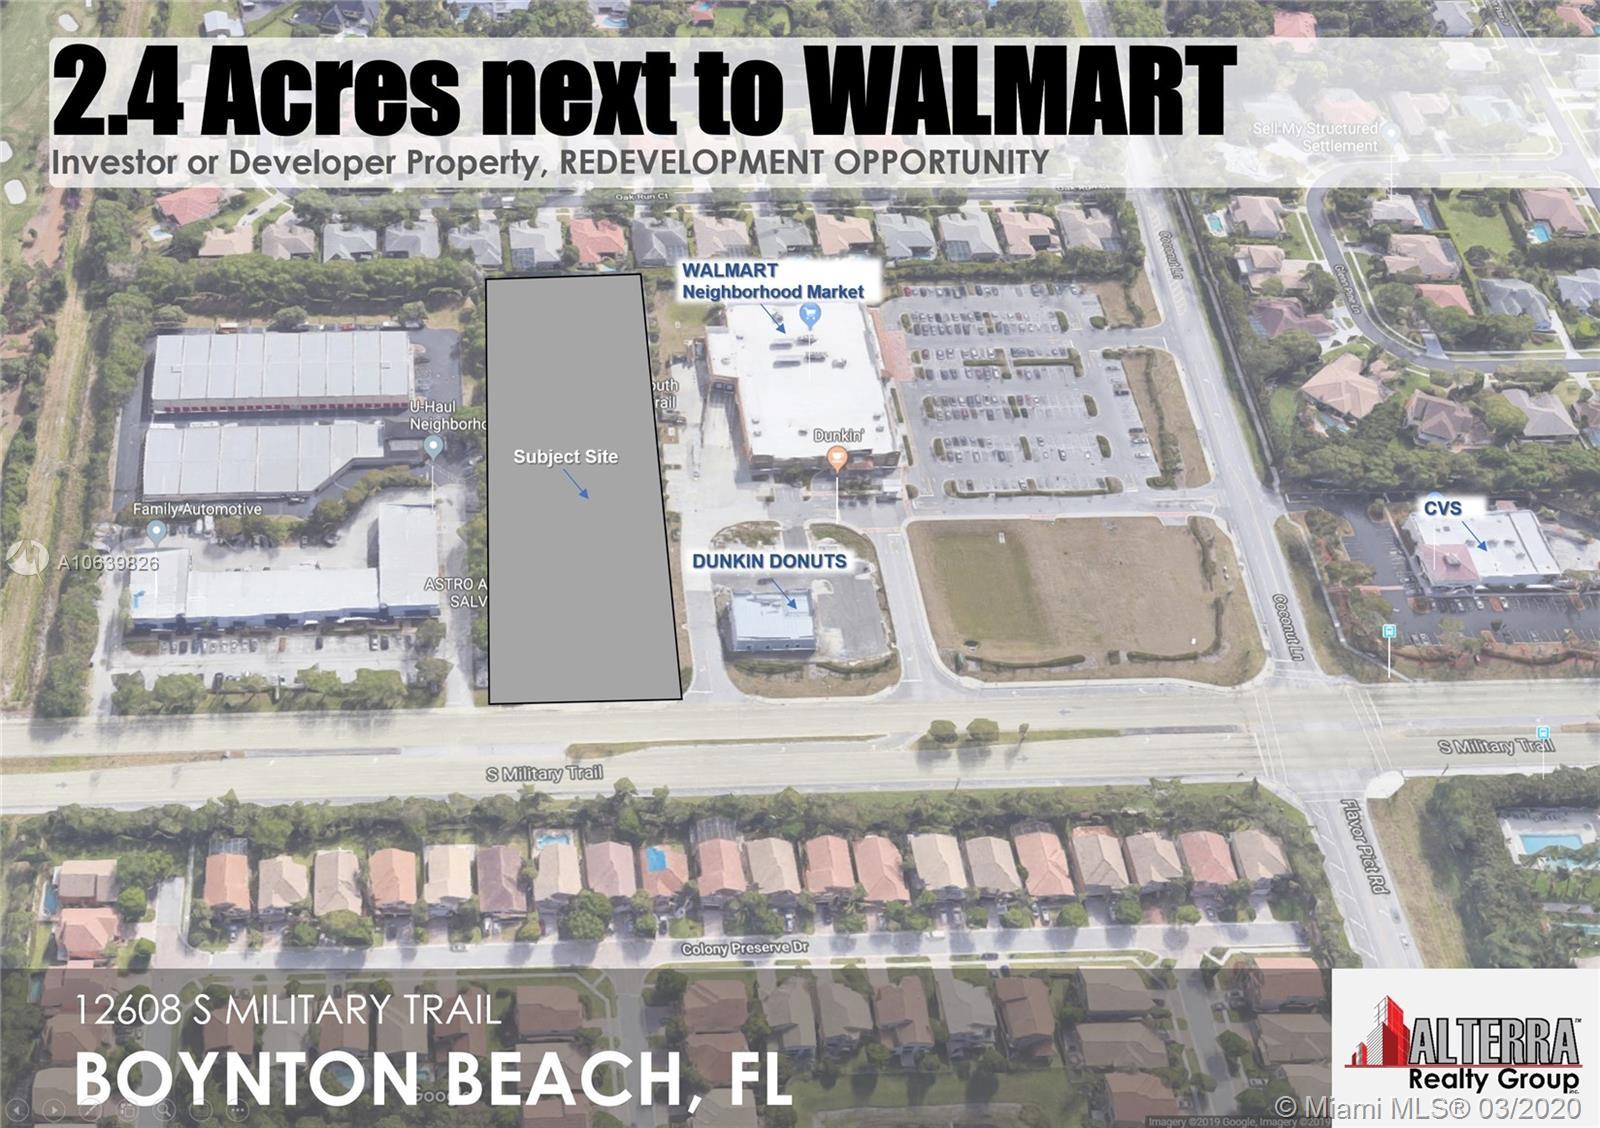 image #1 of property, 2 4 Acres Next To Walmart